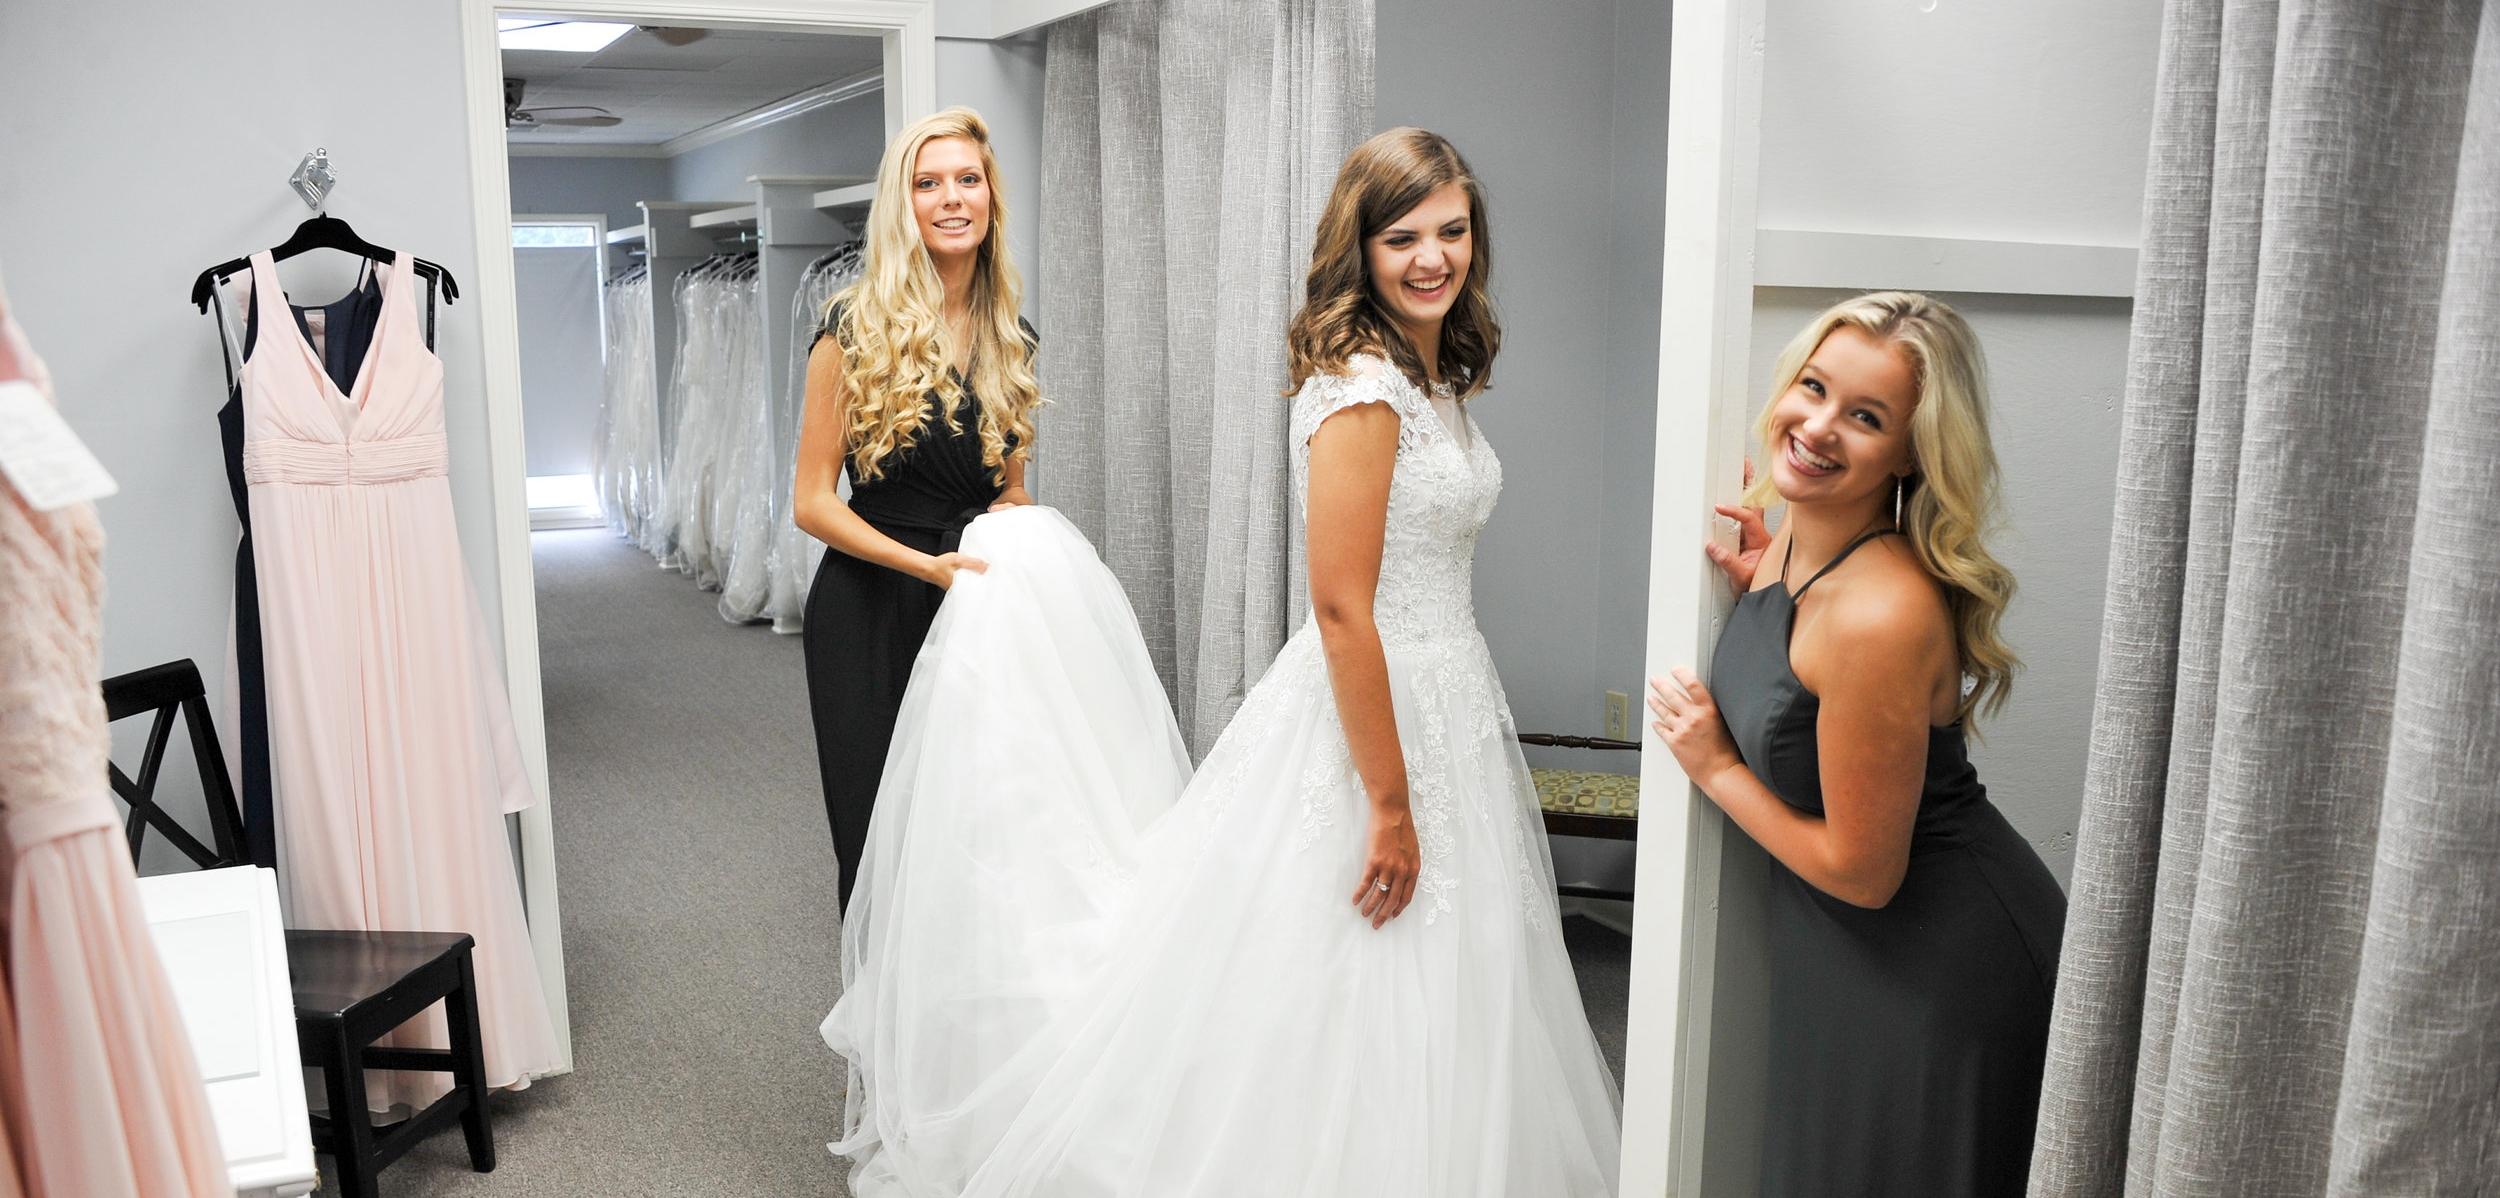 Wedding Dresses & Bridal Shop near Greenville, SC | Carolina Bride ...